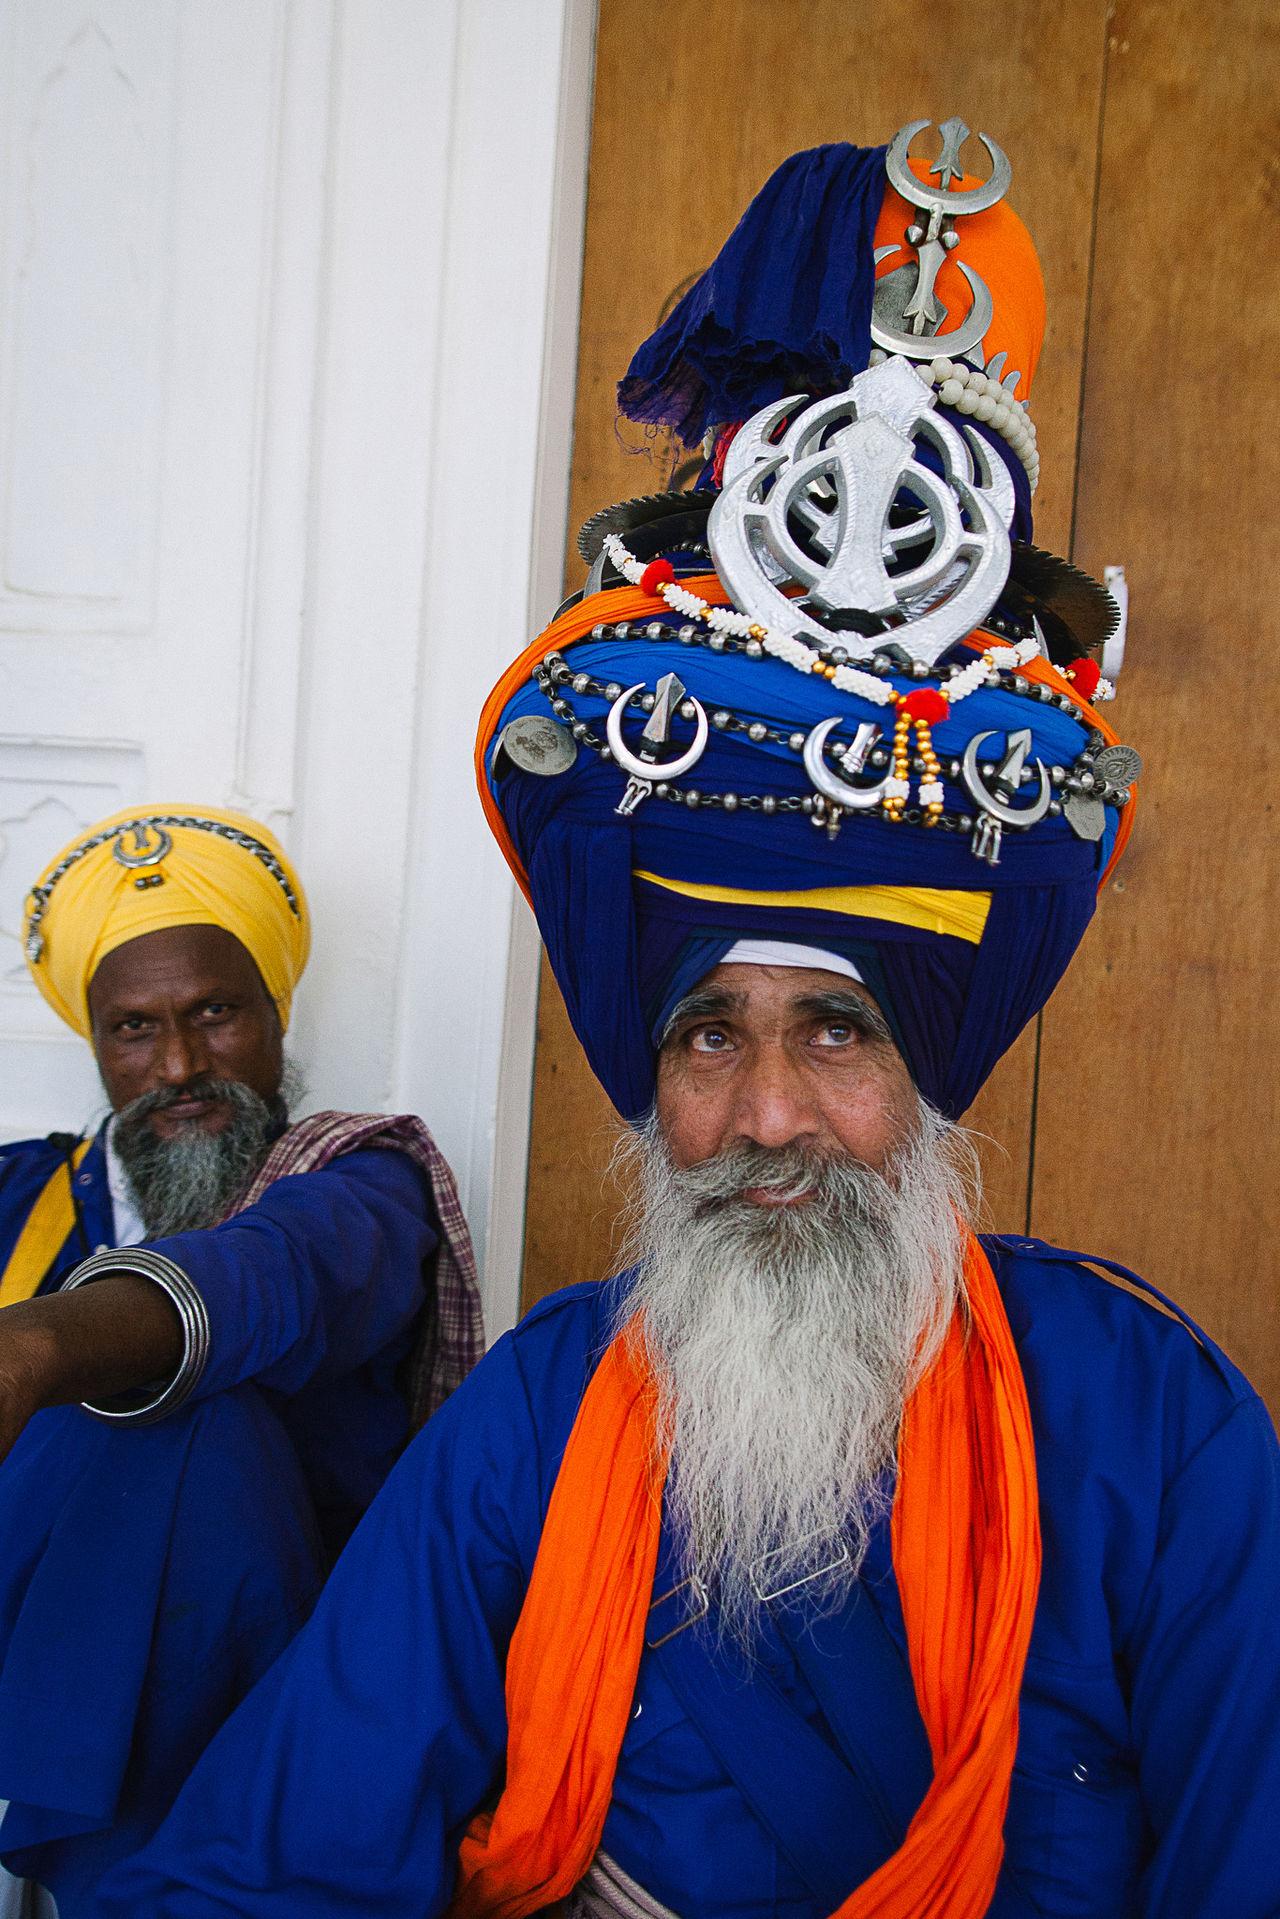 That's a big turban! Portrait Beard Adults Only Traditional Clothing Old-fashioned Adult People Men Punjab Amritsar Golden Temple Gurudwara Guru Sikhism Sikh Indian India Human Body Part